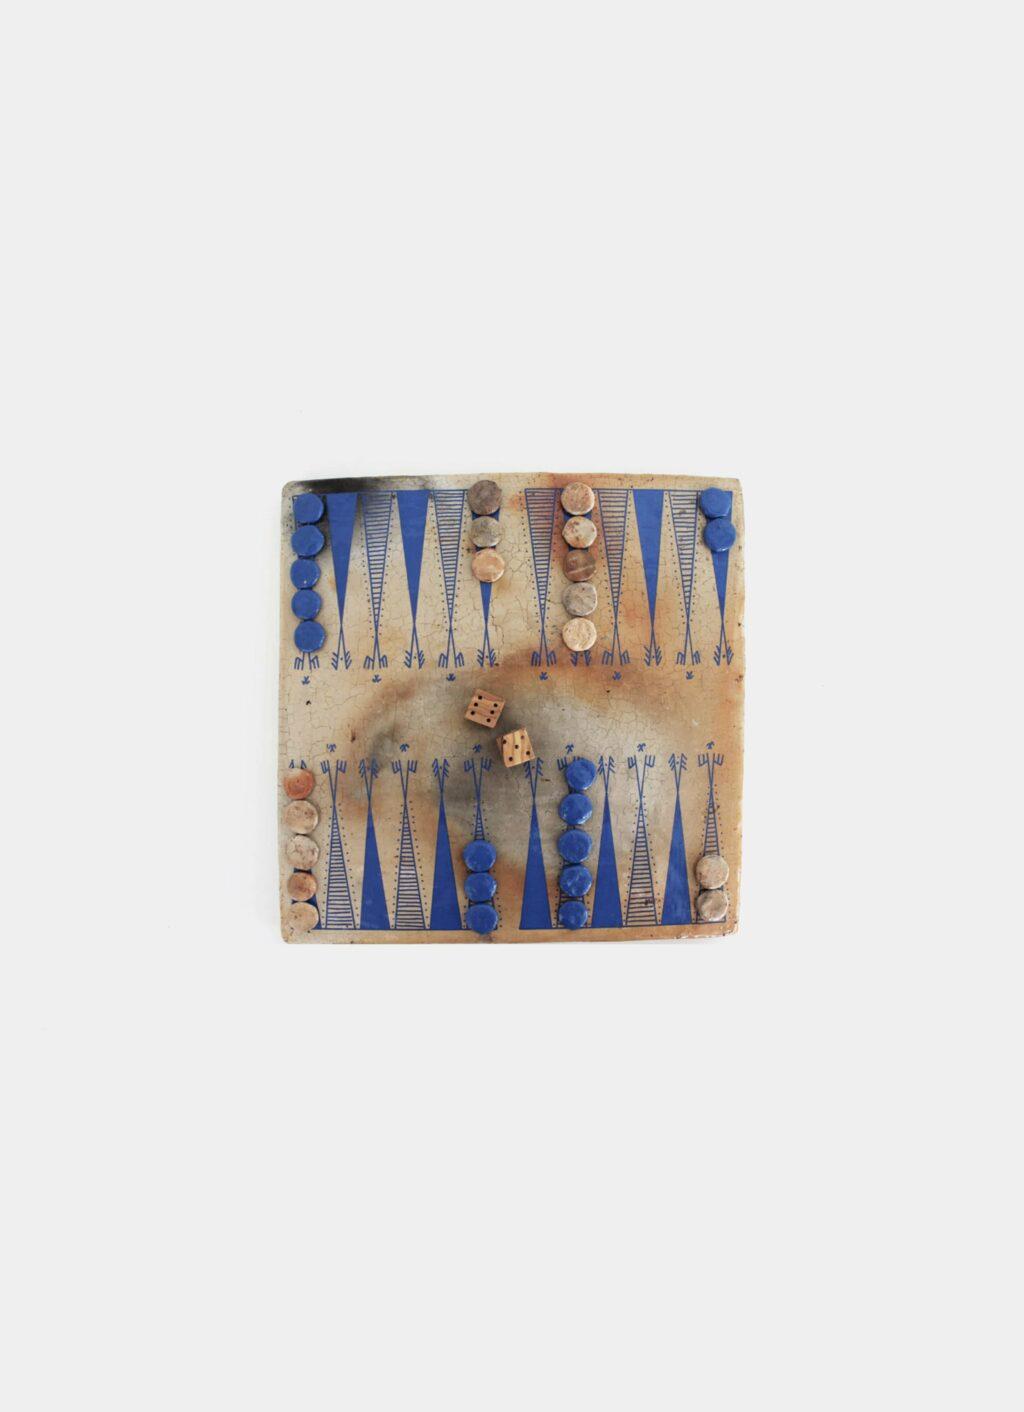 Flayou - Chich-Bich - Terracotta - Backgammon - Special Edition - Neon blue